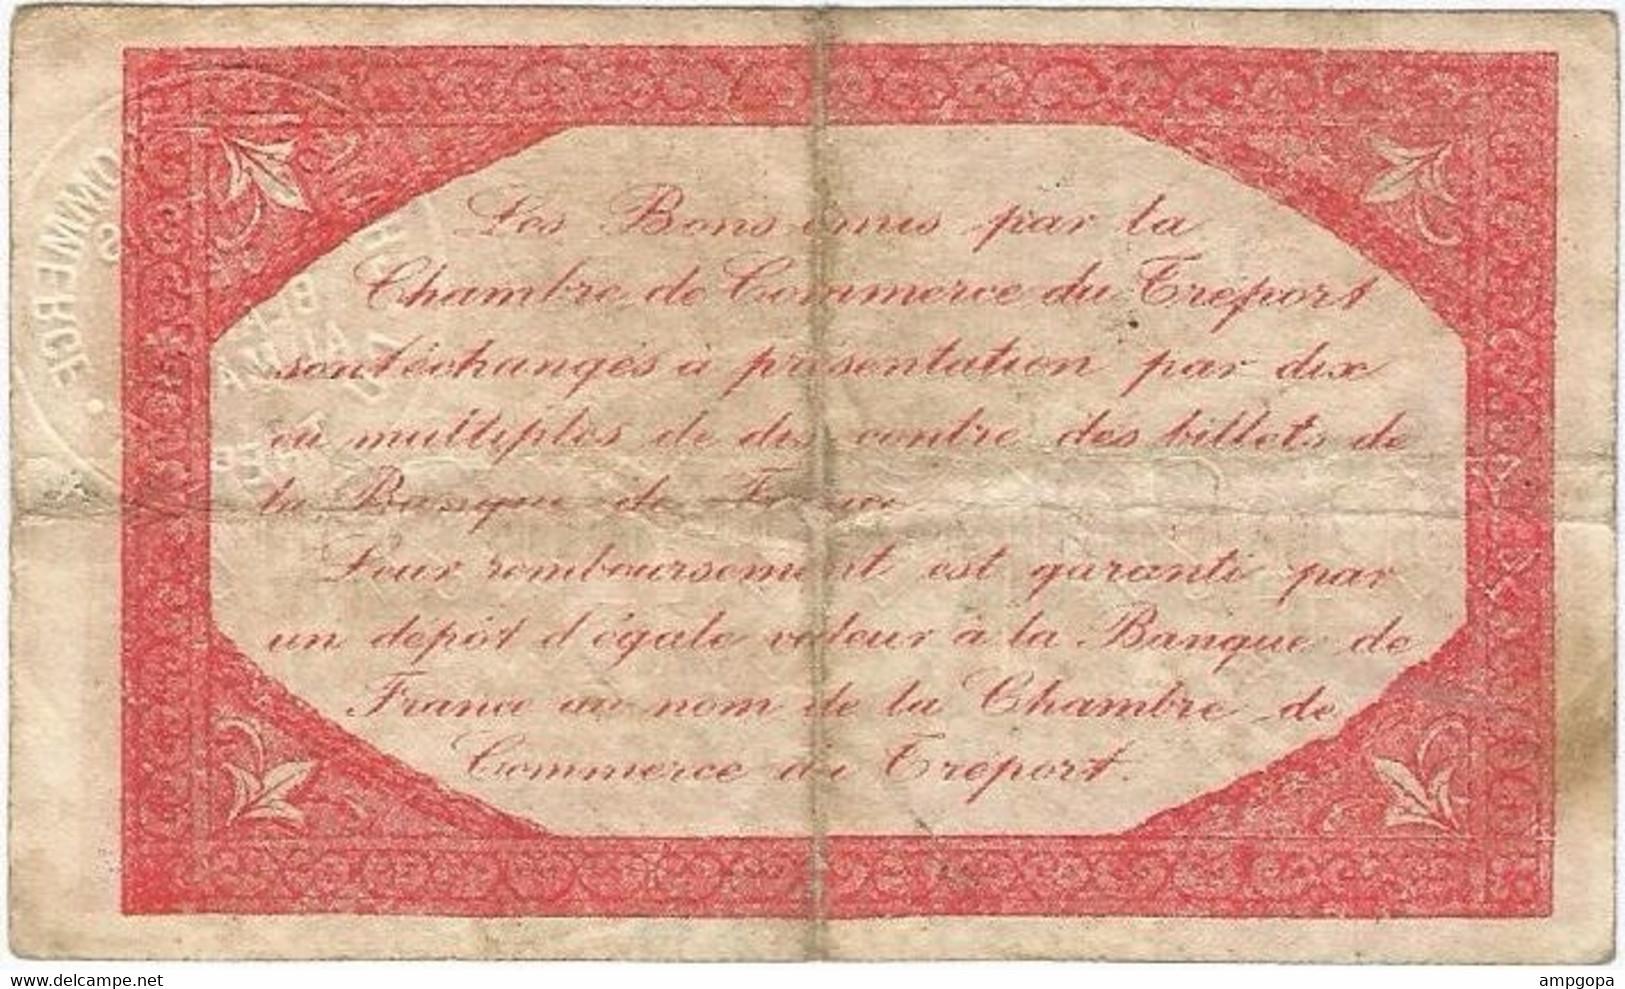 Francia - France 25 Céntimes 13-10-1916 Le Tréport Ref 4735-2 - Chamber Of Commerce